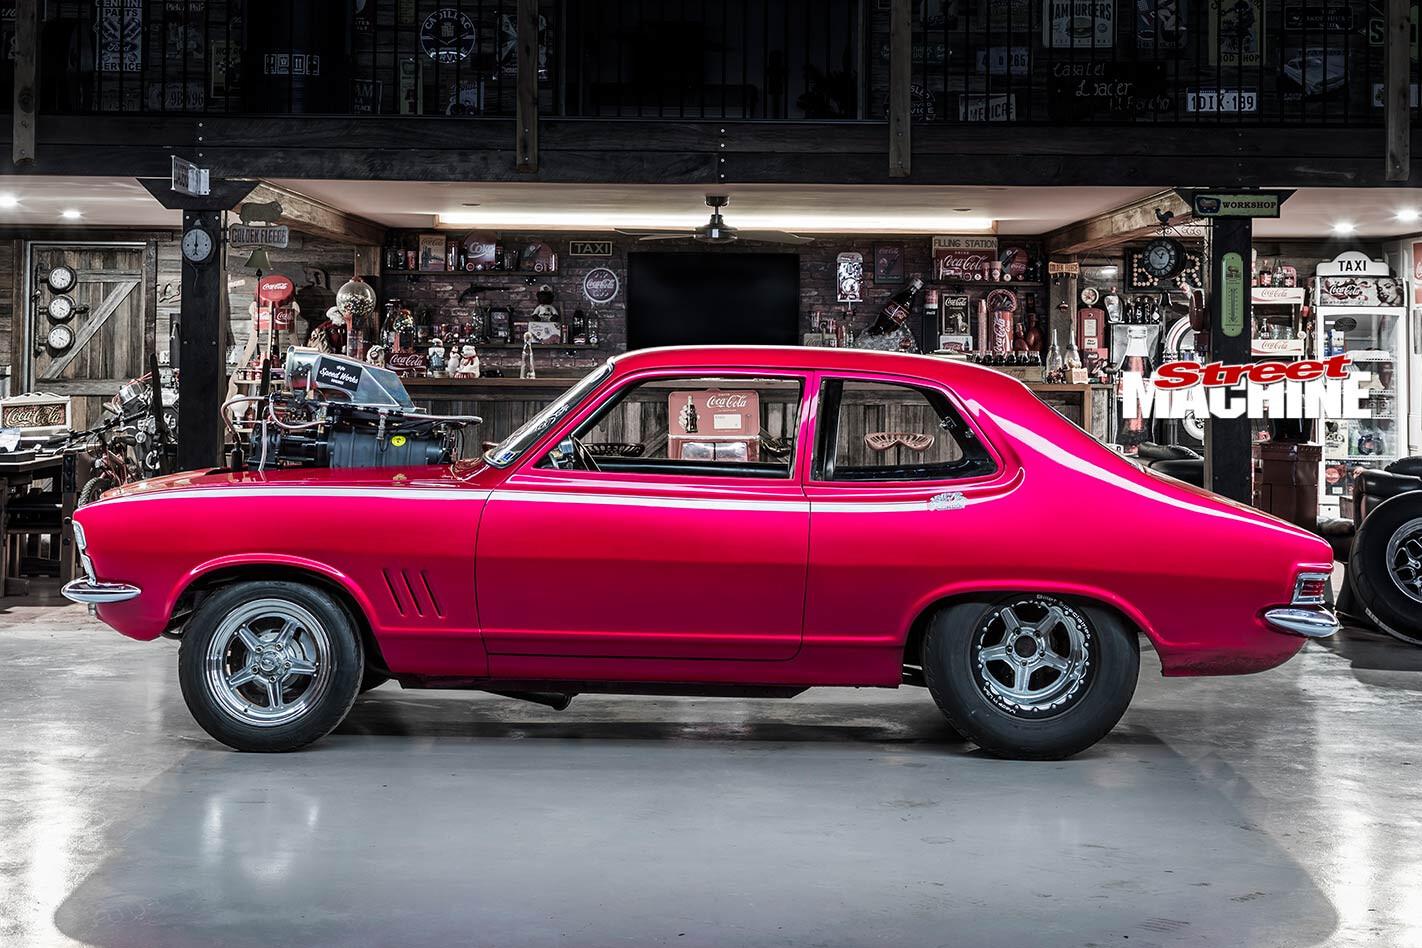 Holden LC Torana side